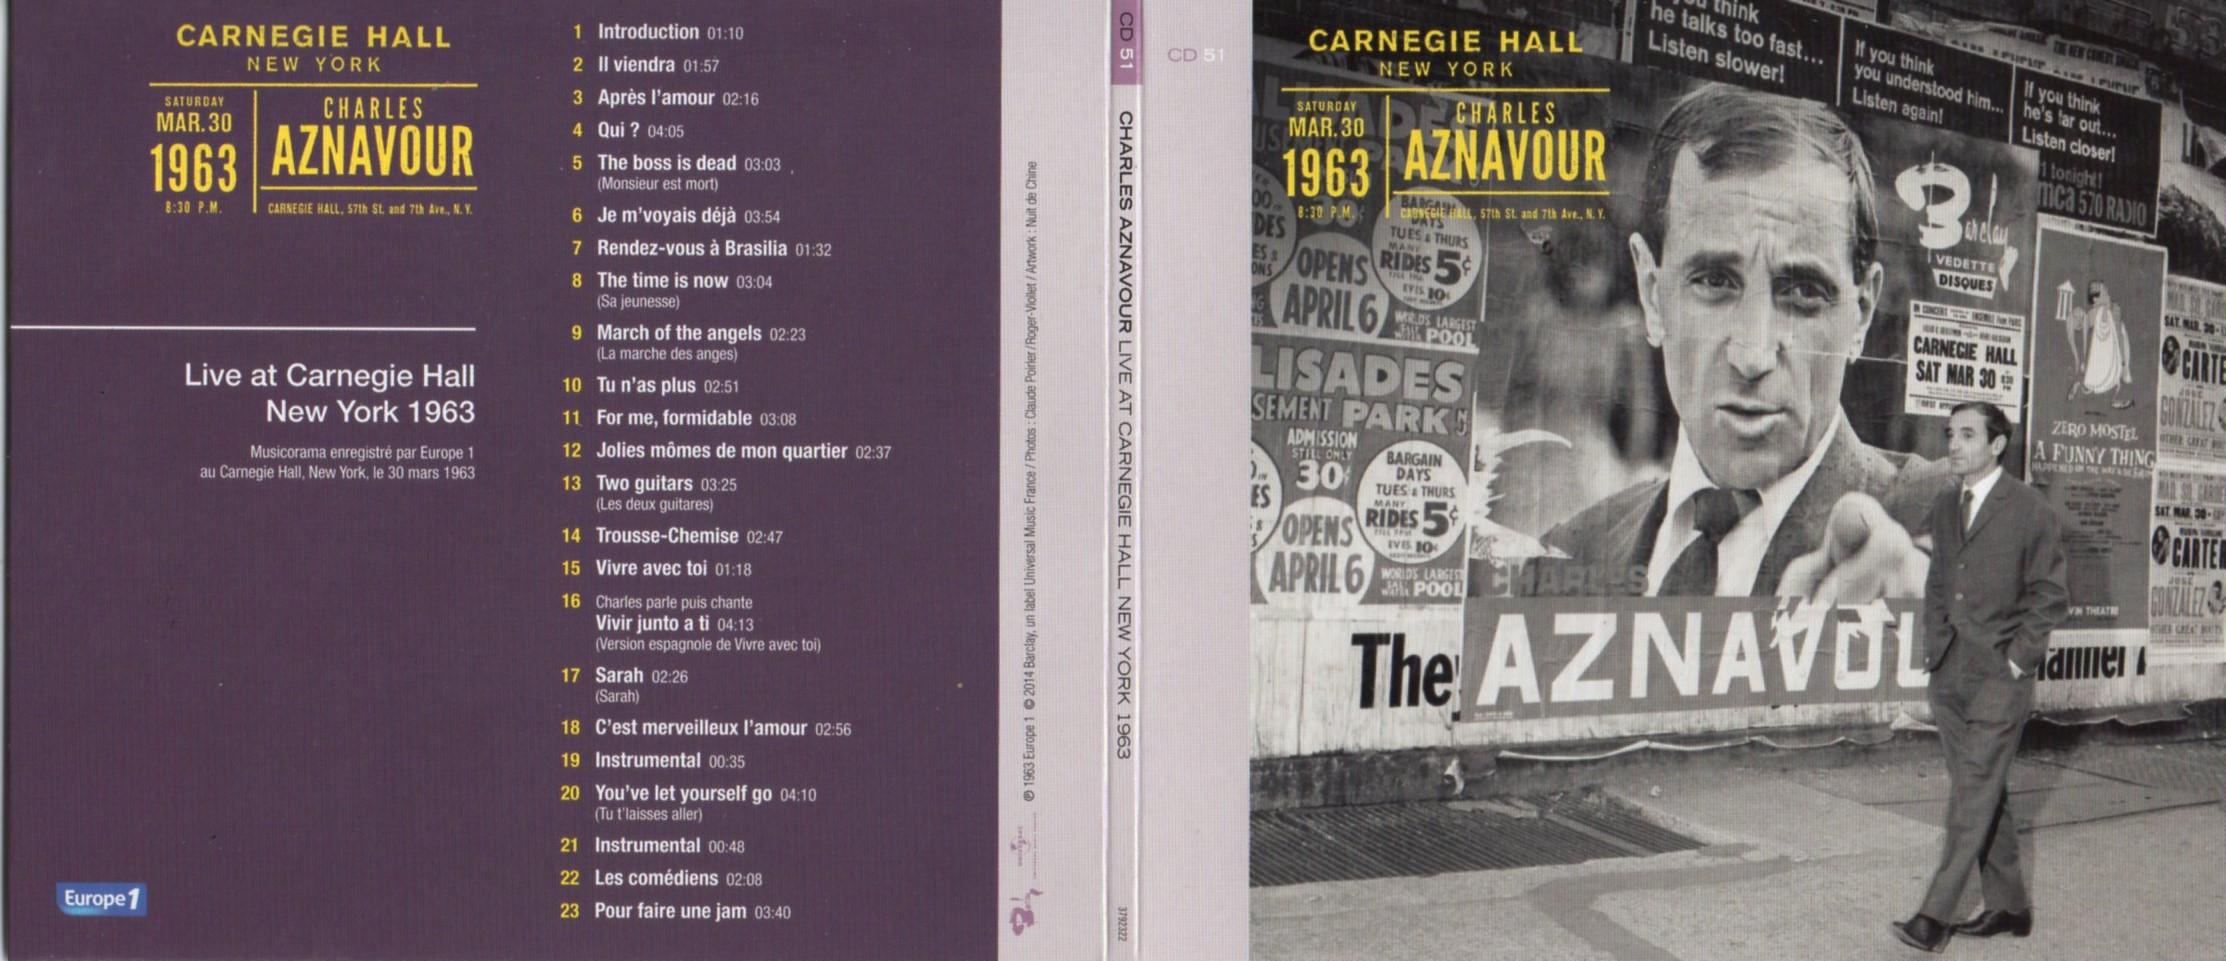 CHARLES AZNAVOUR - Live at Carnegie Hall New York 1963 Gatefold Card board sleeve - CD